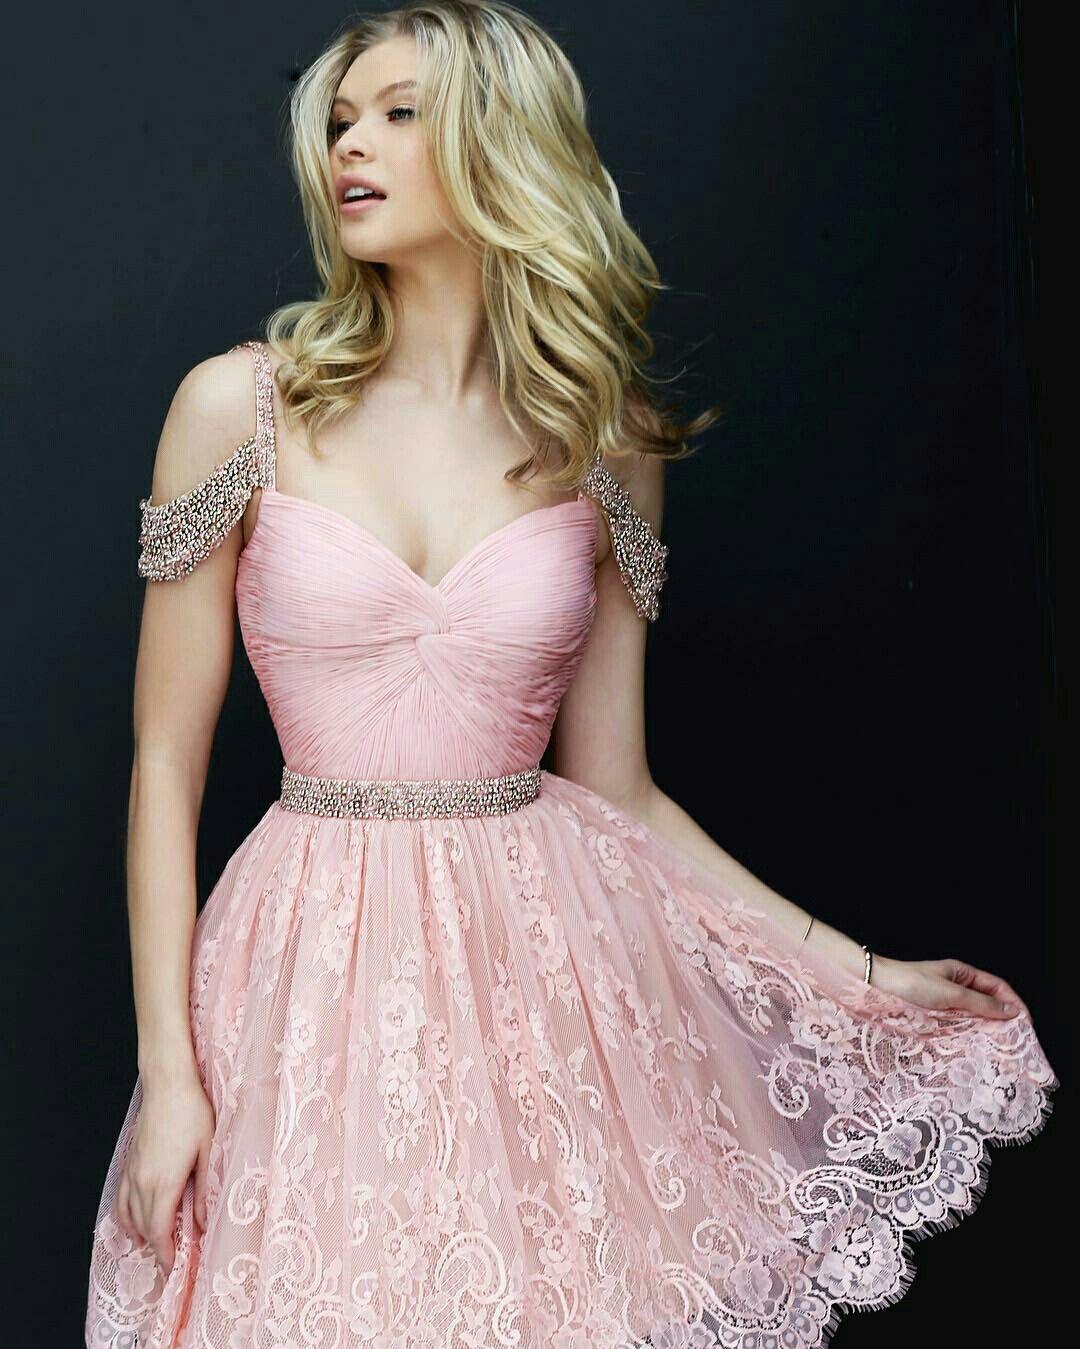 Prom dresses Lace Blush Sherri Hill 50503 Short A Line Homecoming Dress